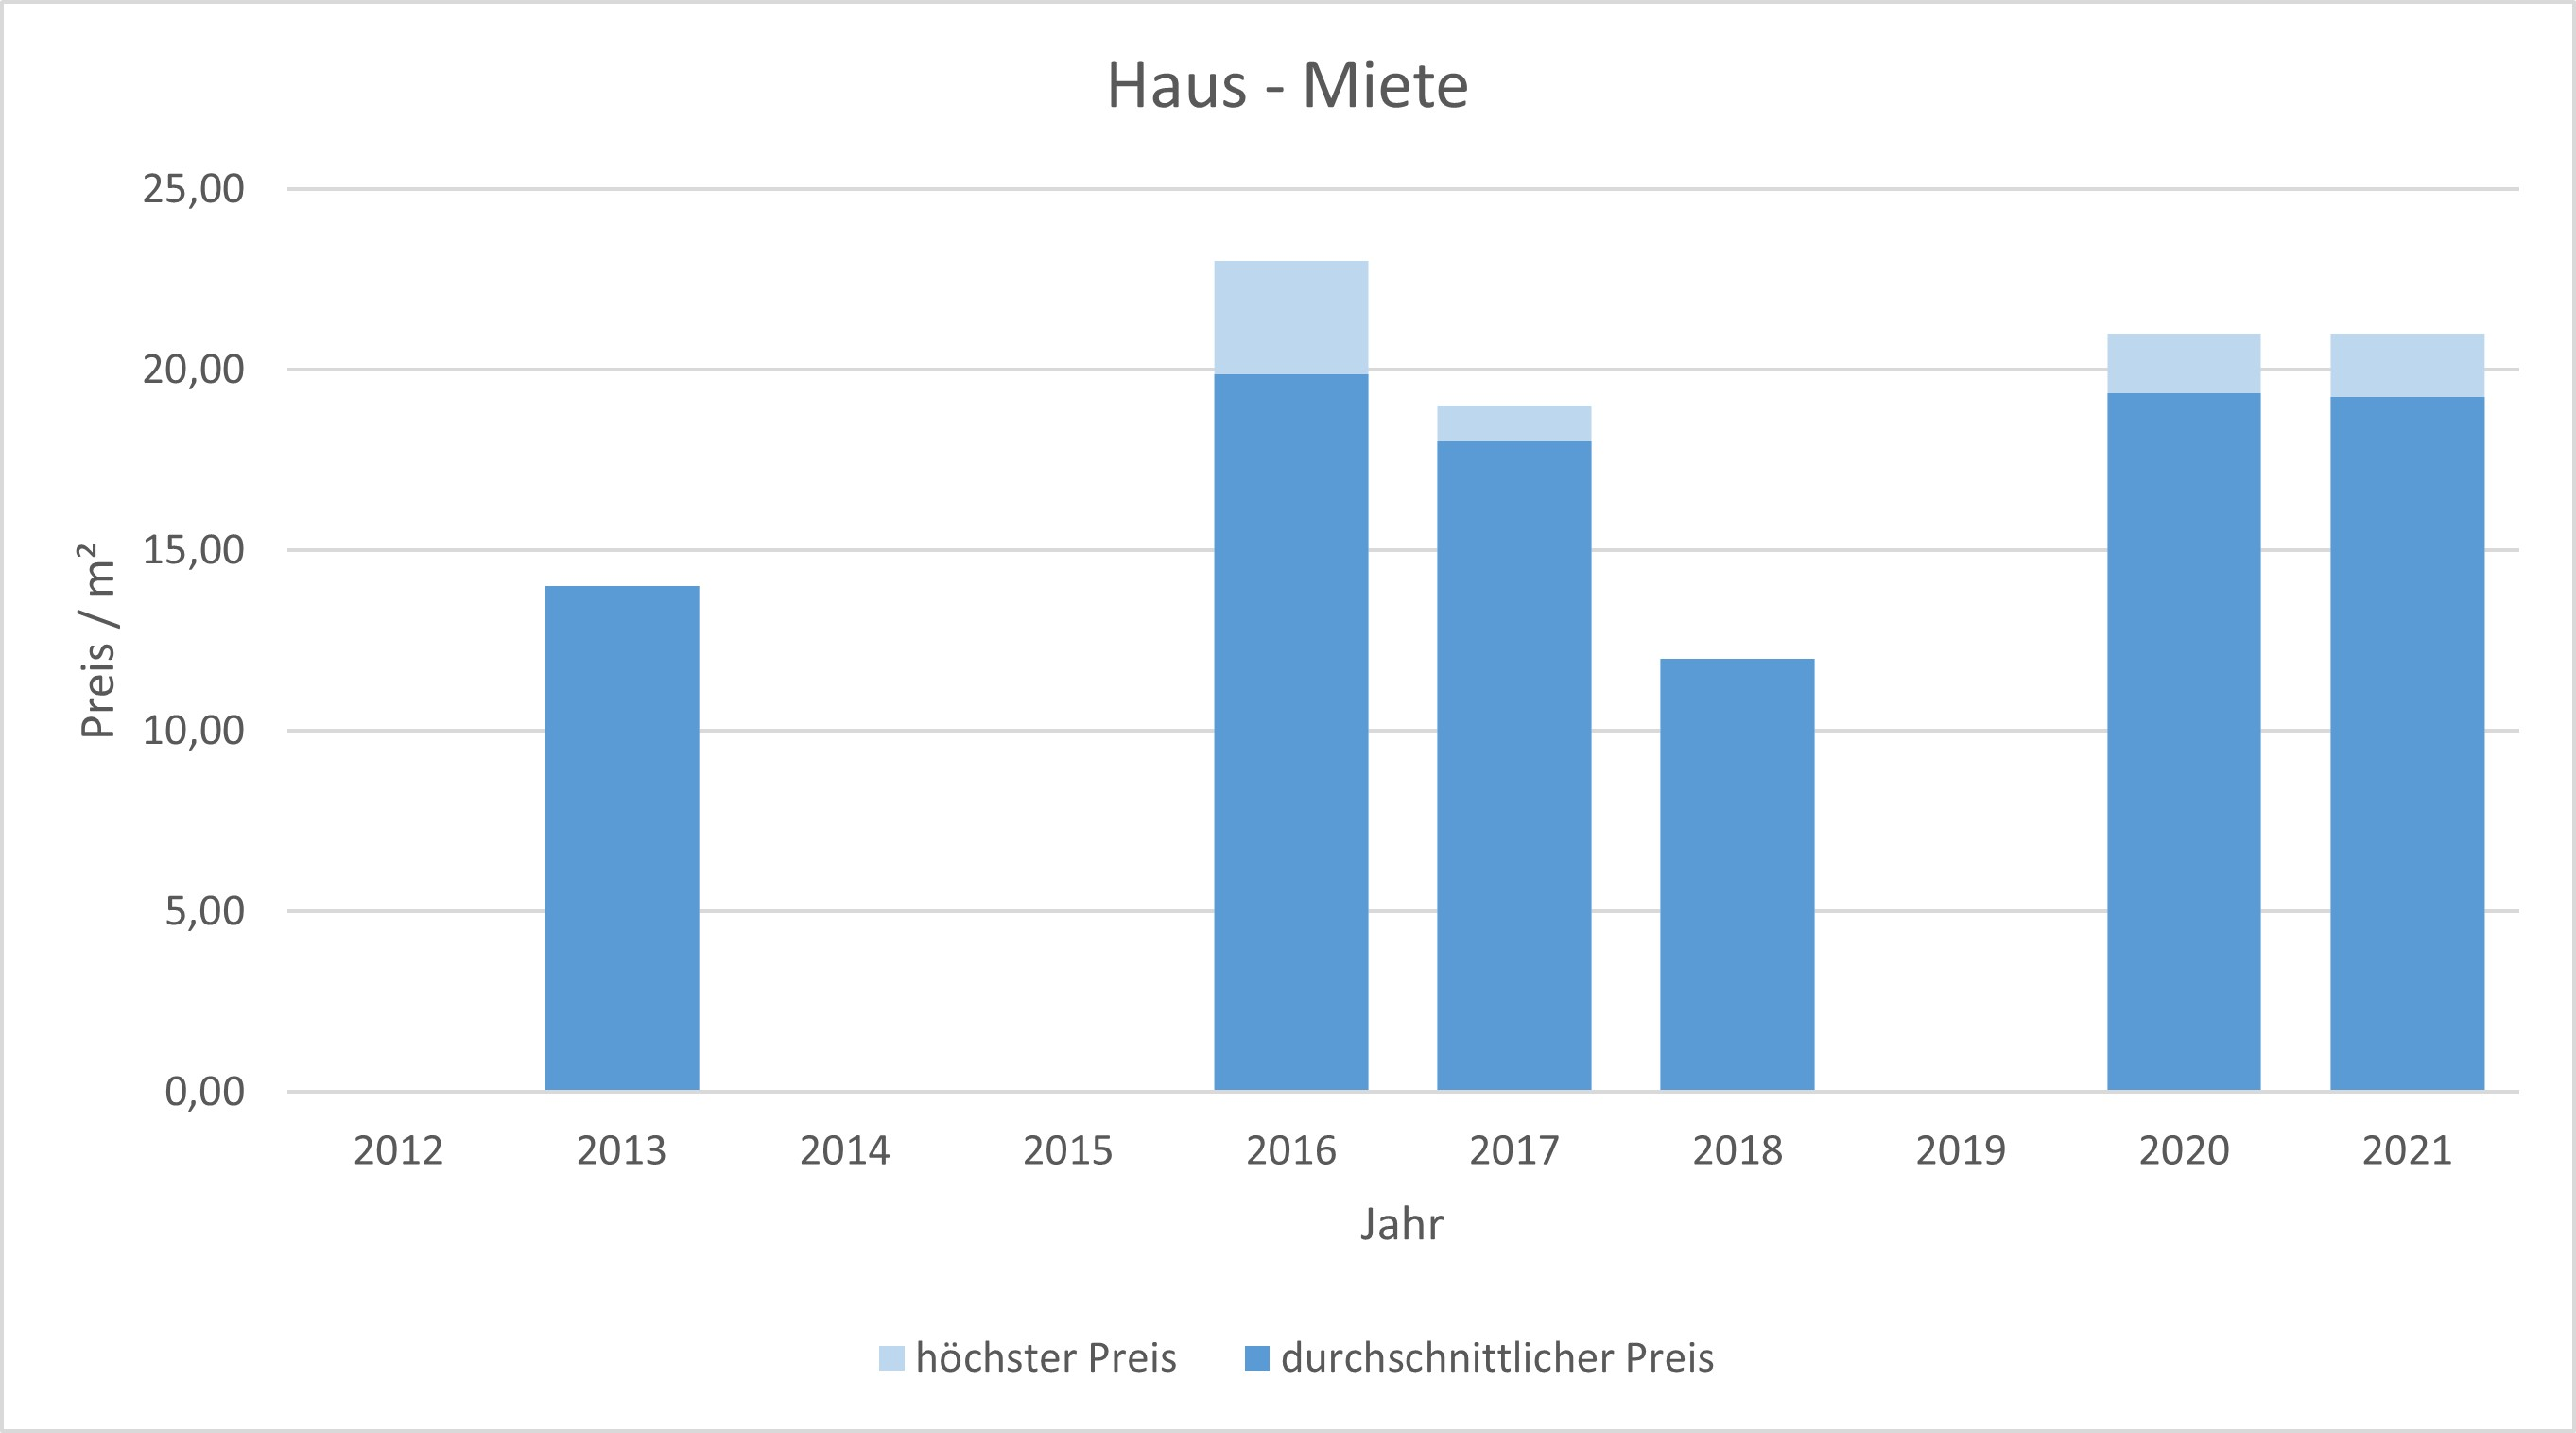 München - Daglfing Haus mieten vermieten Preis Bewertung Makler 2019 2020 2021 www.happy-immo.de